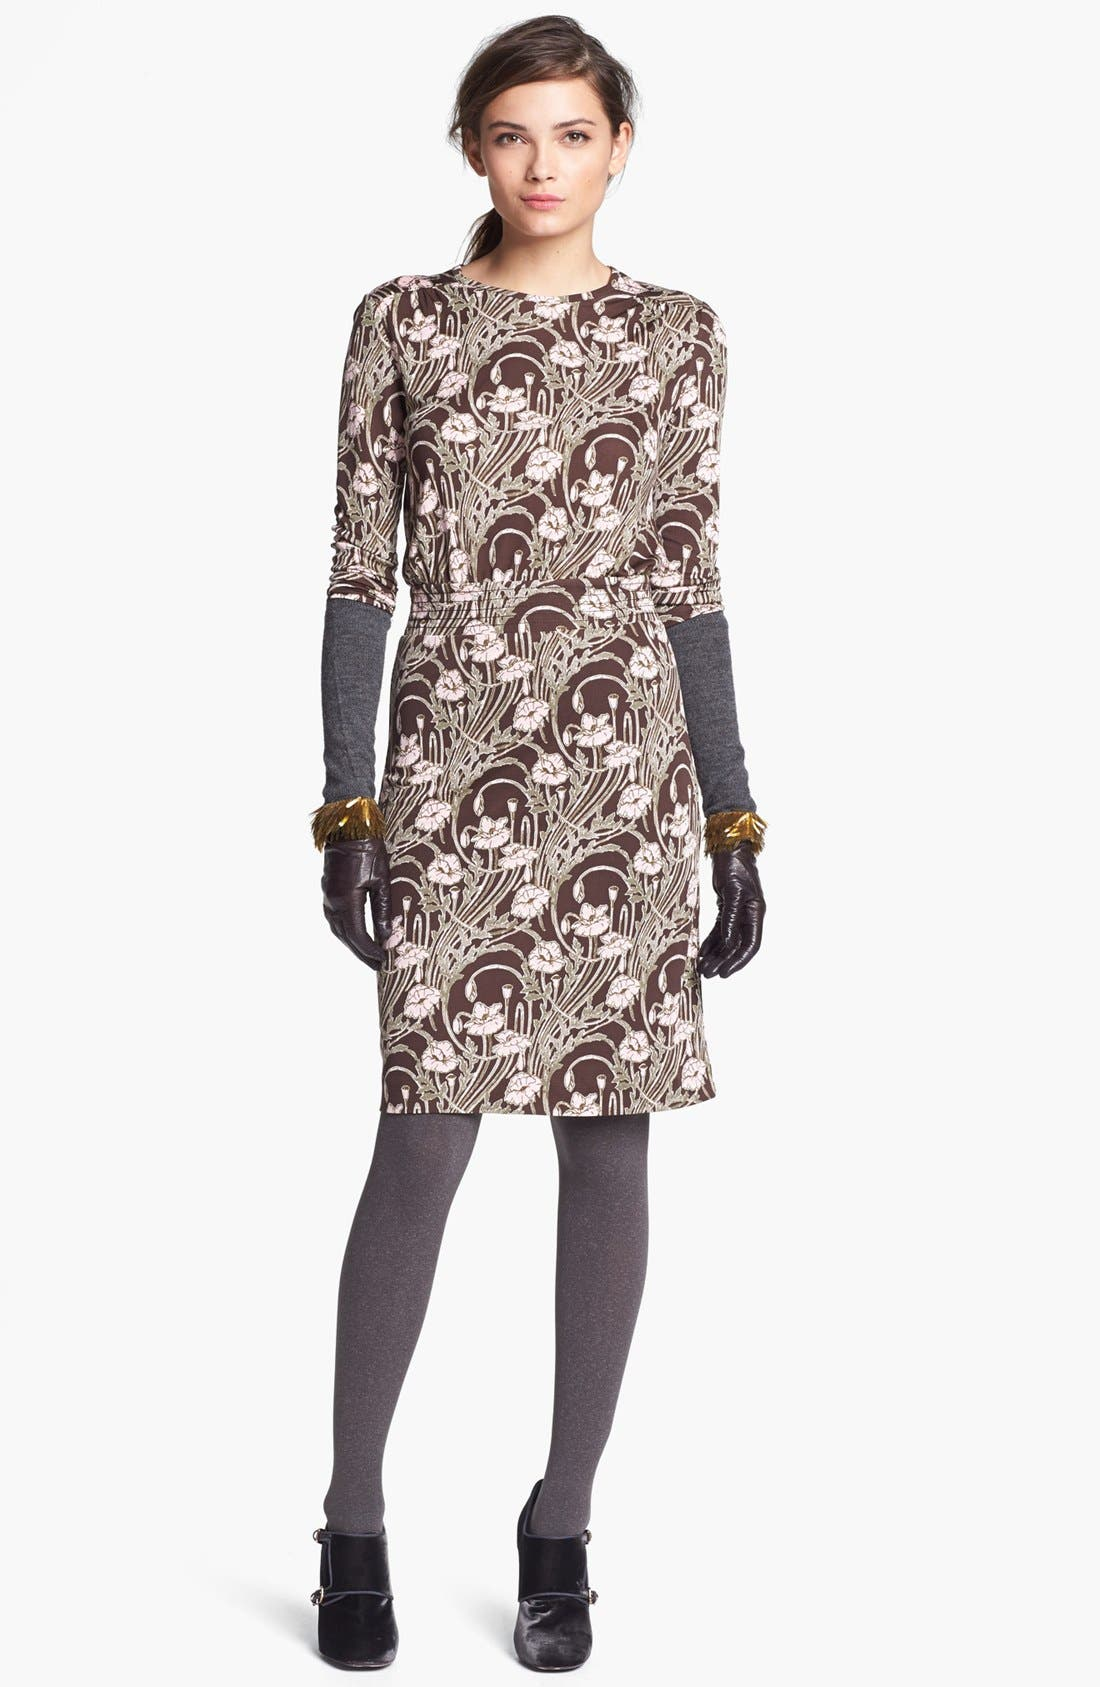 Alternate Image 1 Selected - Tory Burch Dress & Pump